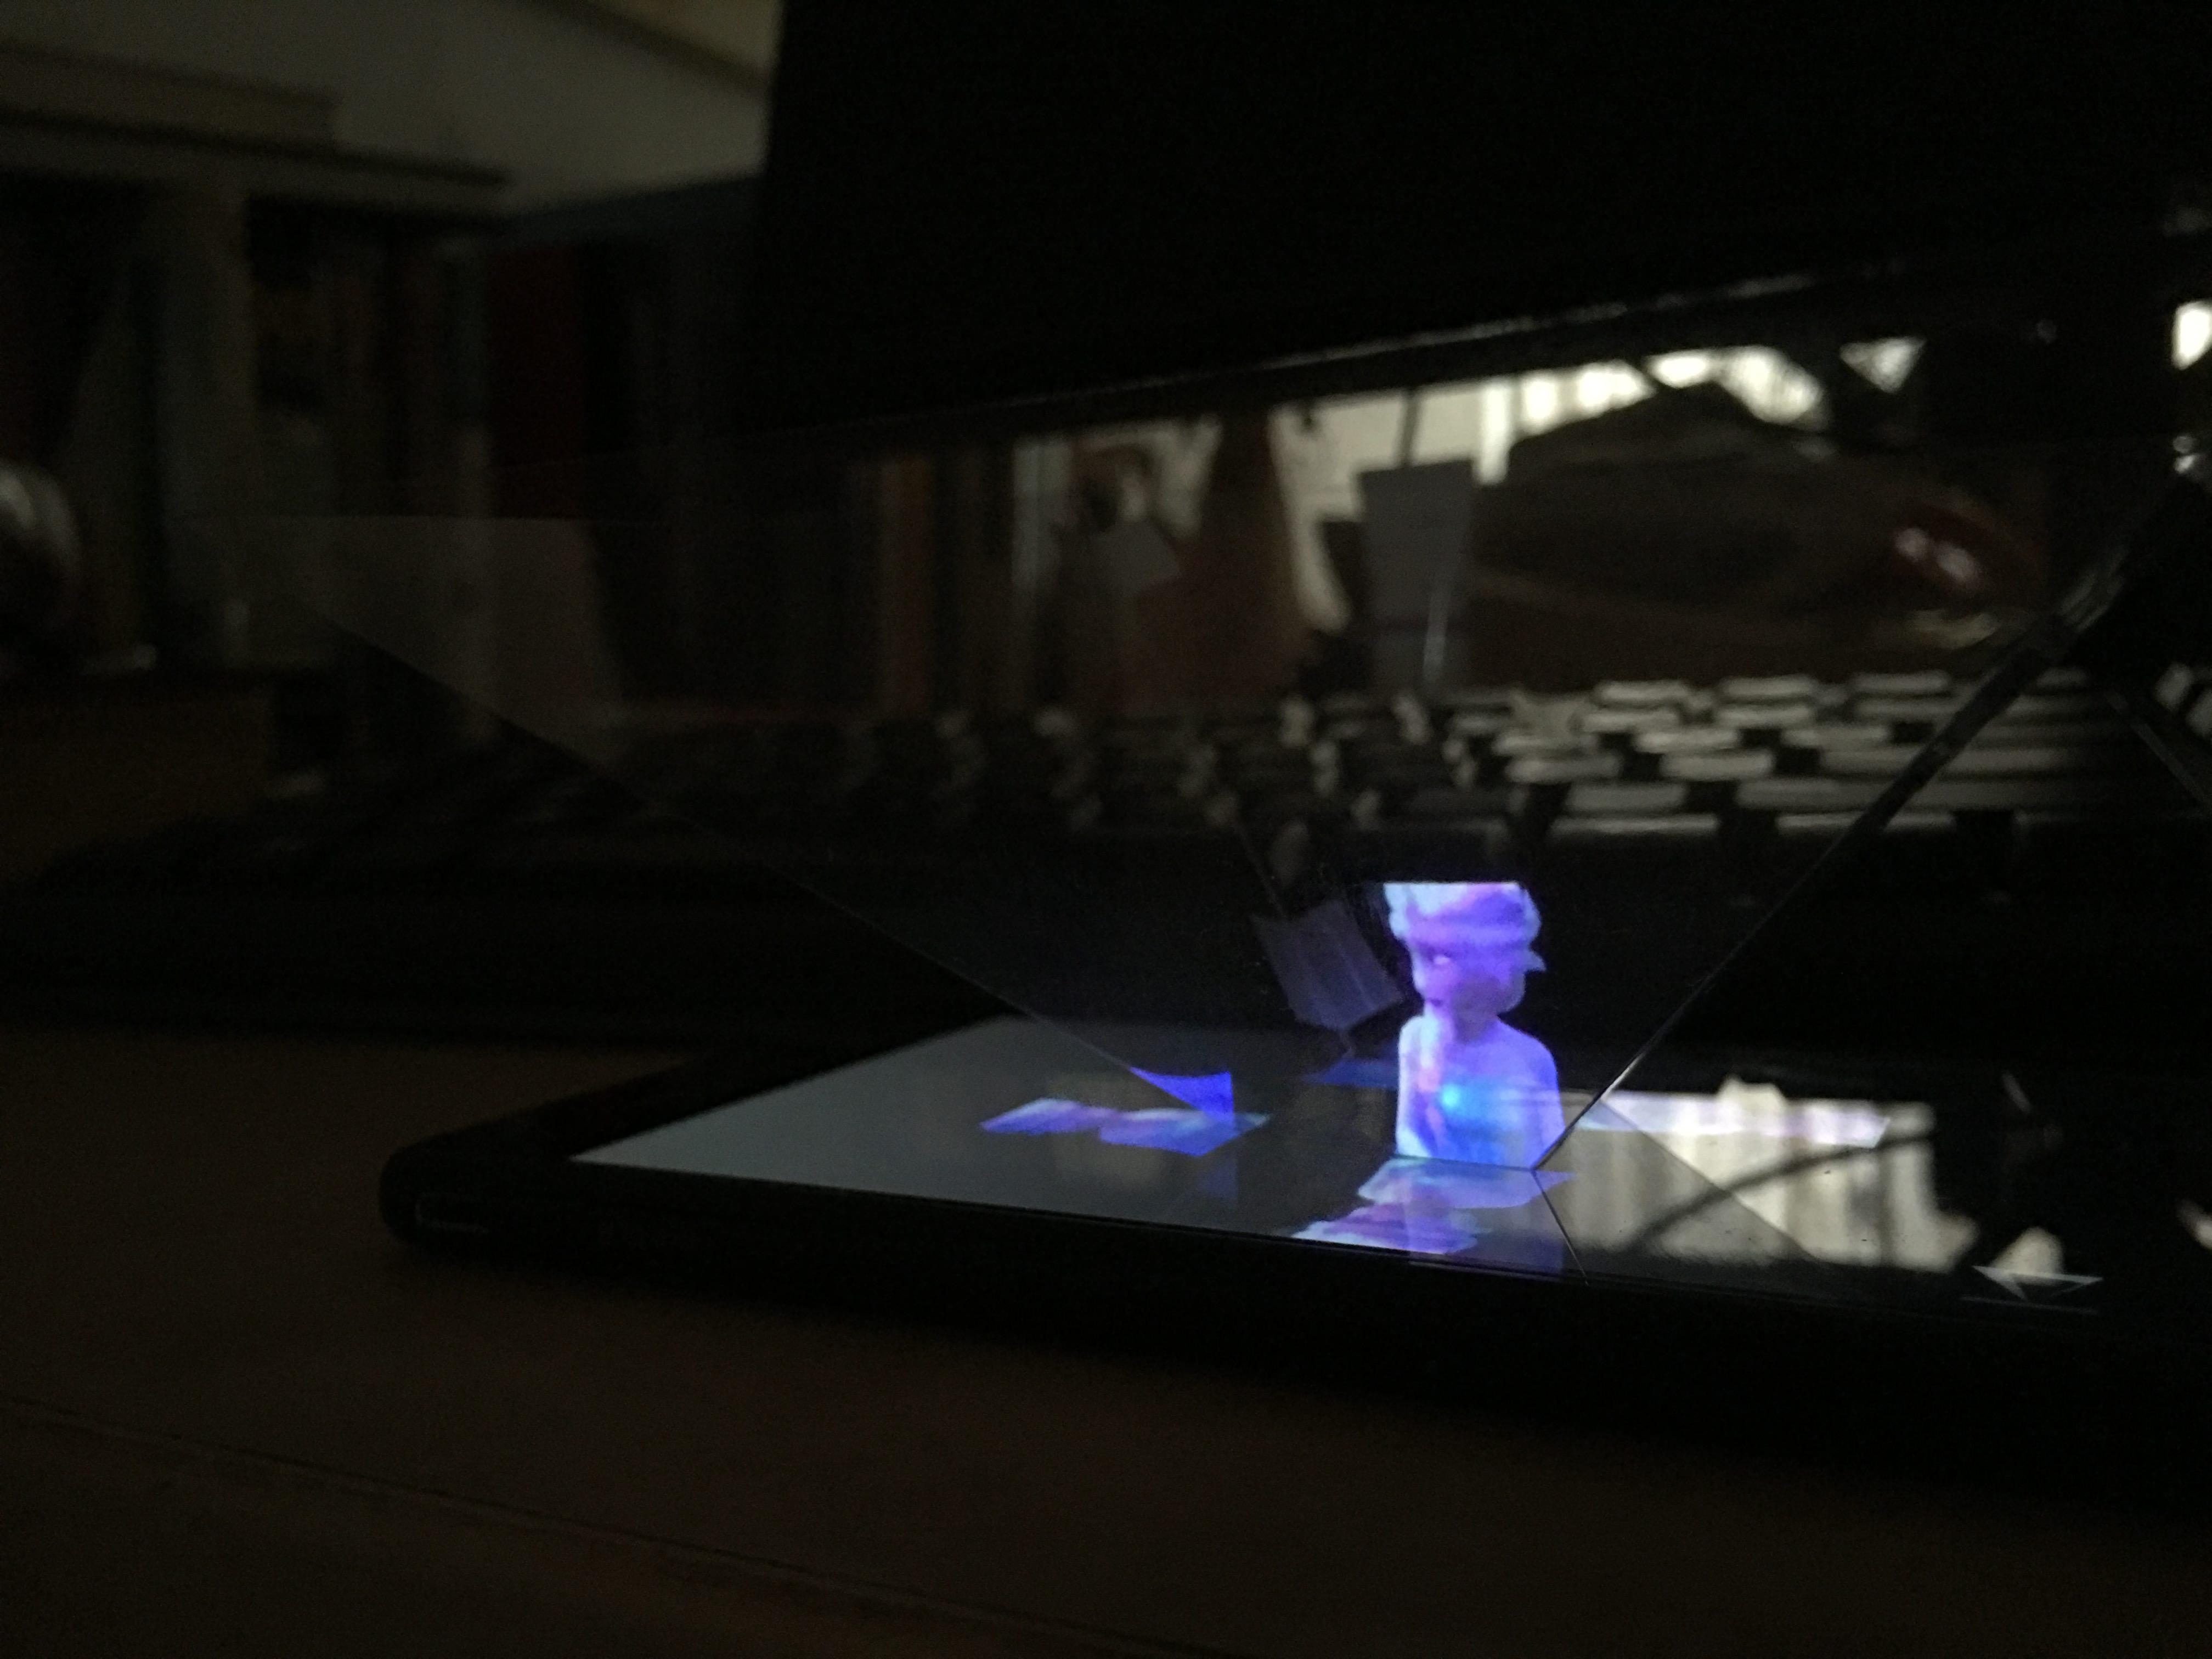 Голограмма на смартфоне своими руками 37